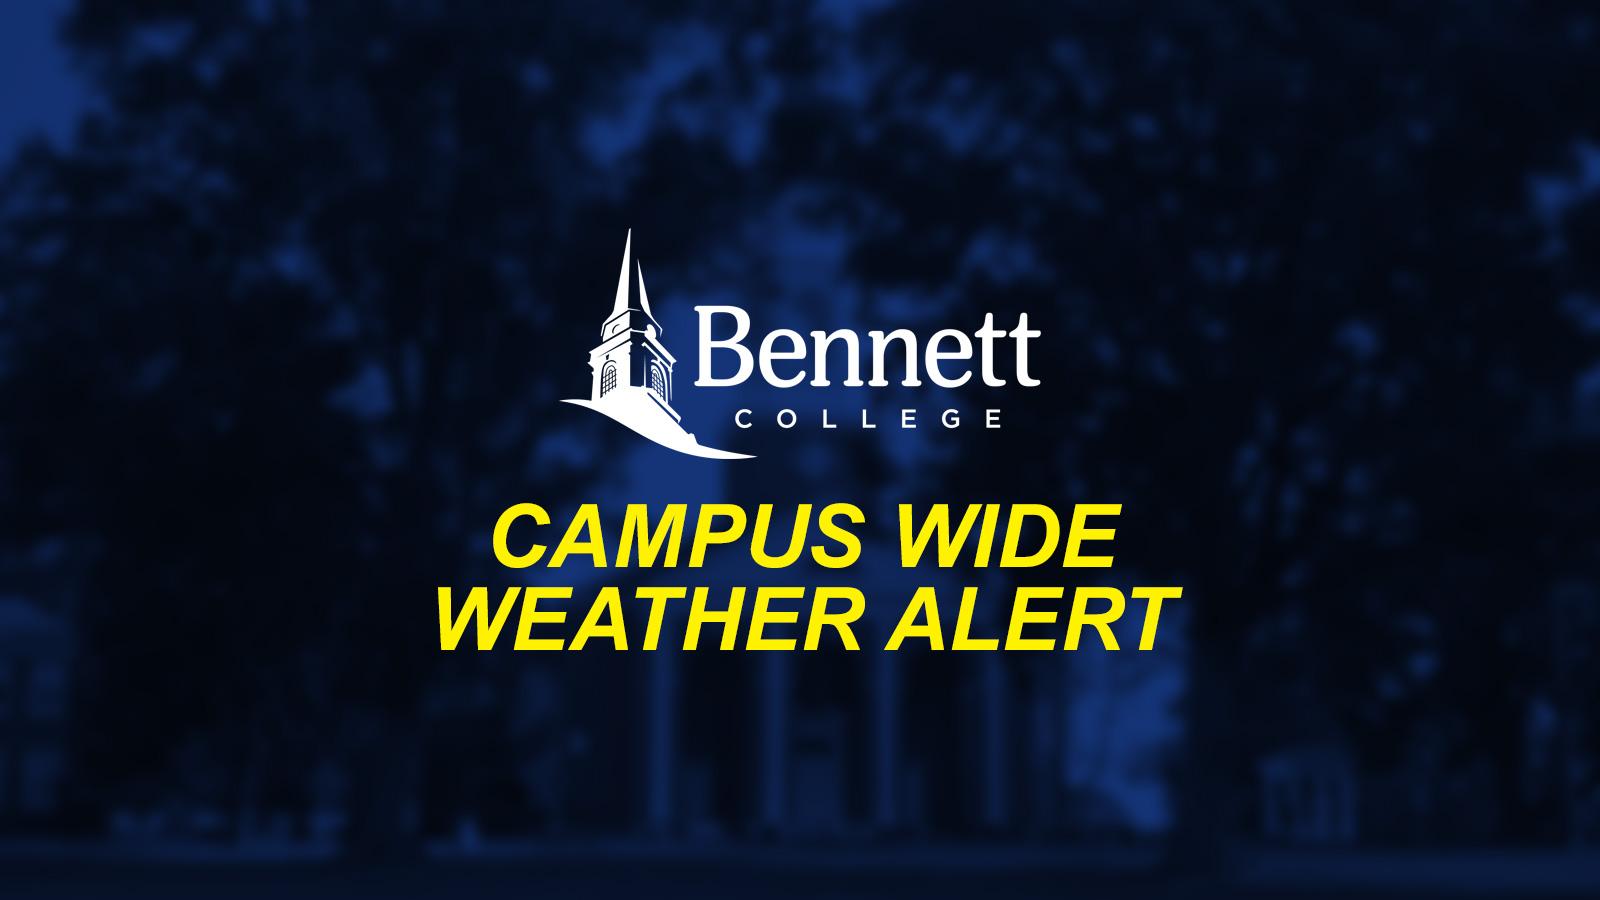 [UPDATE: 1/10/17 @ 6:28 PM] Campus Wide Alert (Weather Condition)